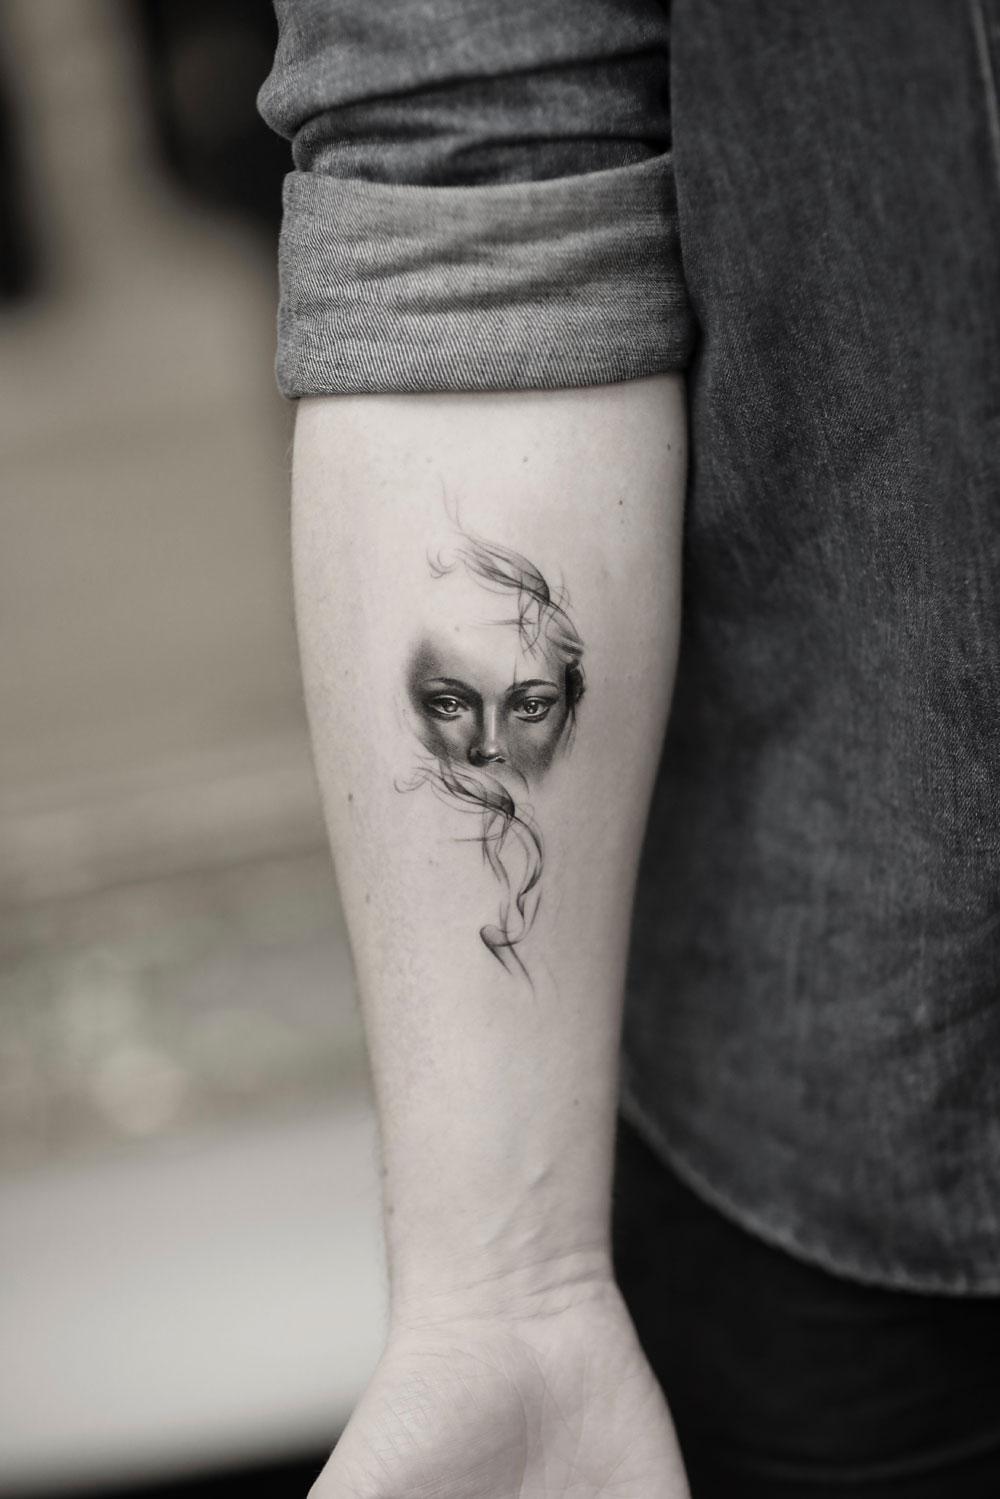 Woman-Protrait-by-Alessandro-Capozzi-in-Aureo-Roma-Tattoo-&-Gallery.jpg